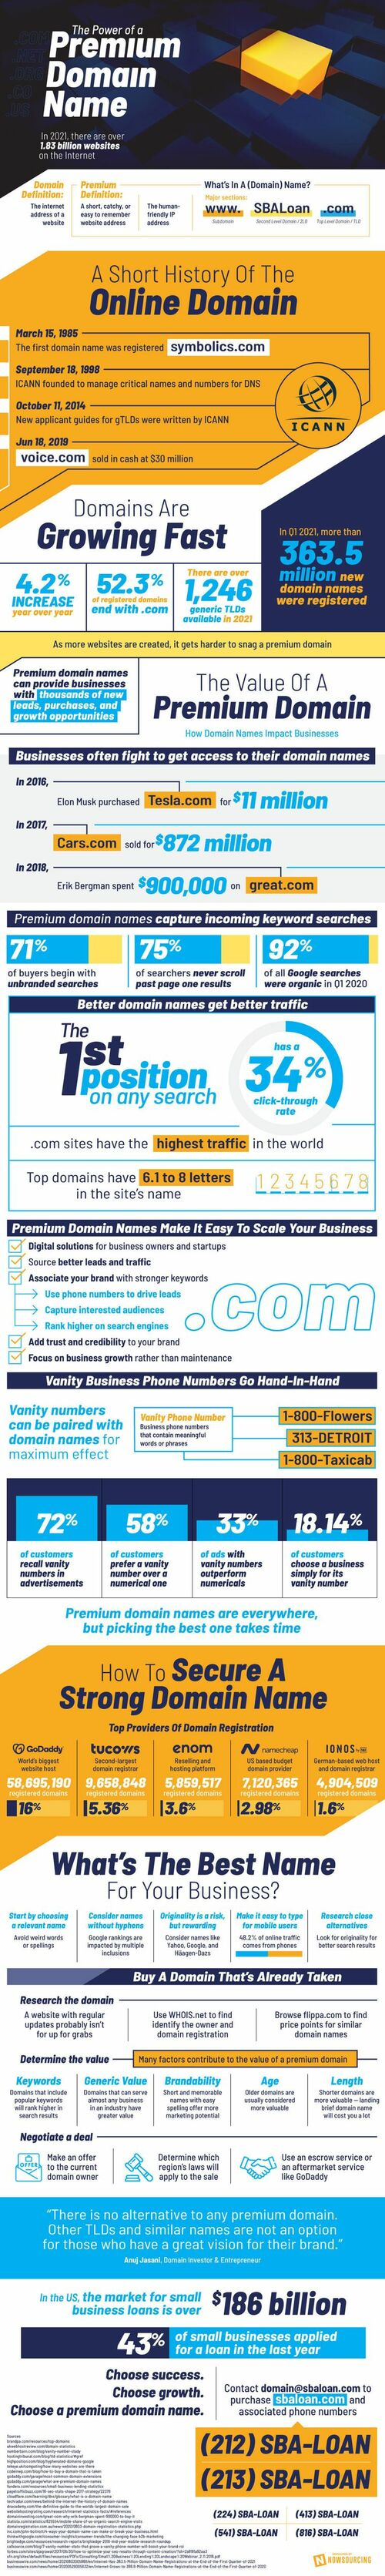 The Power of  Premium Domain Name via Brian Wallace